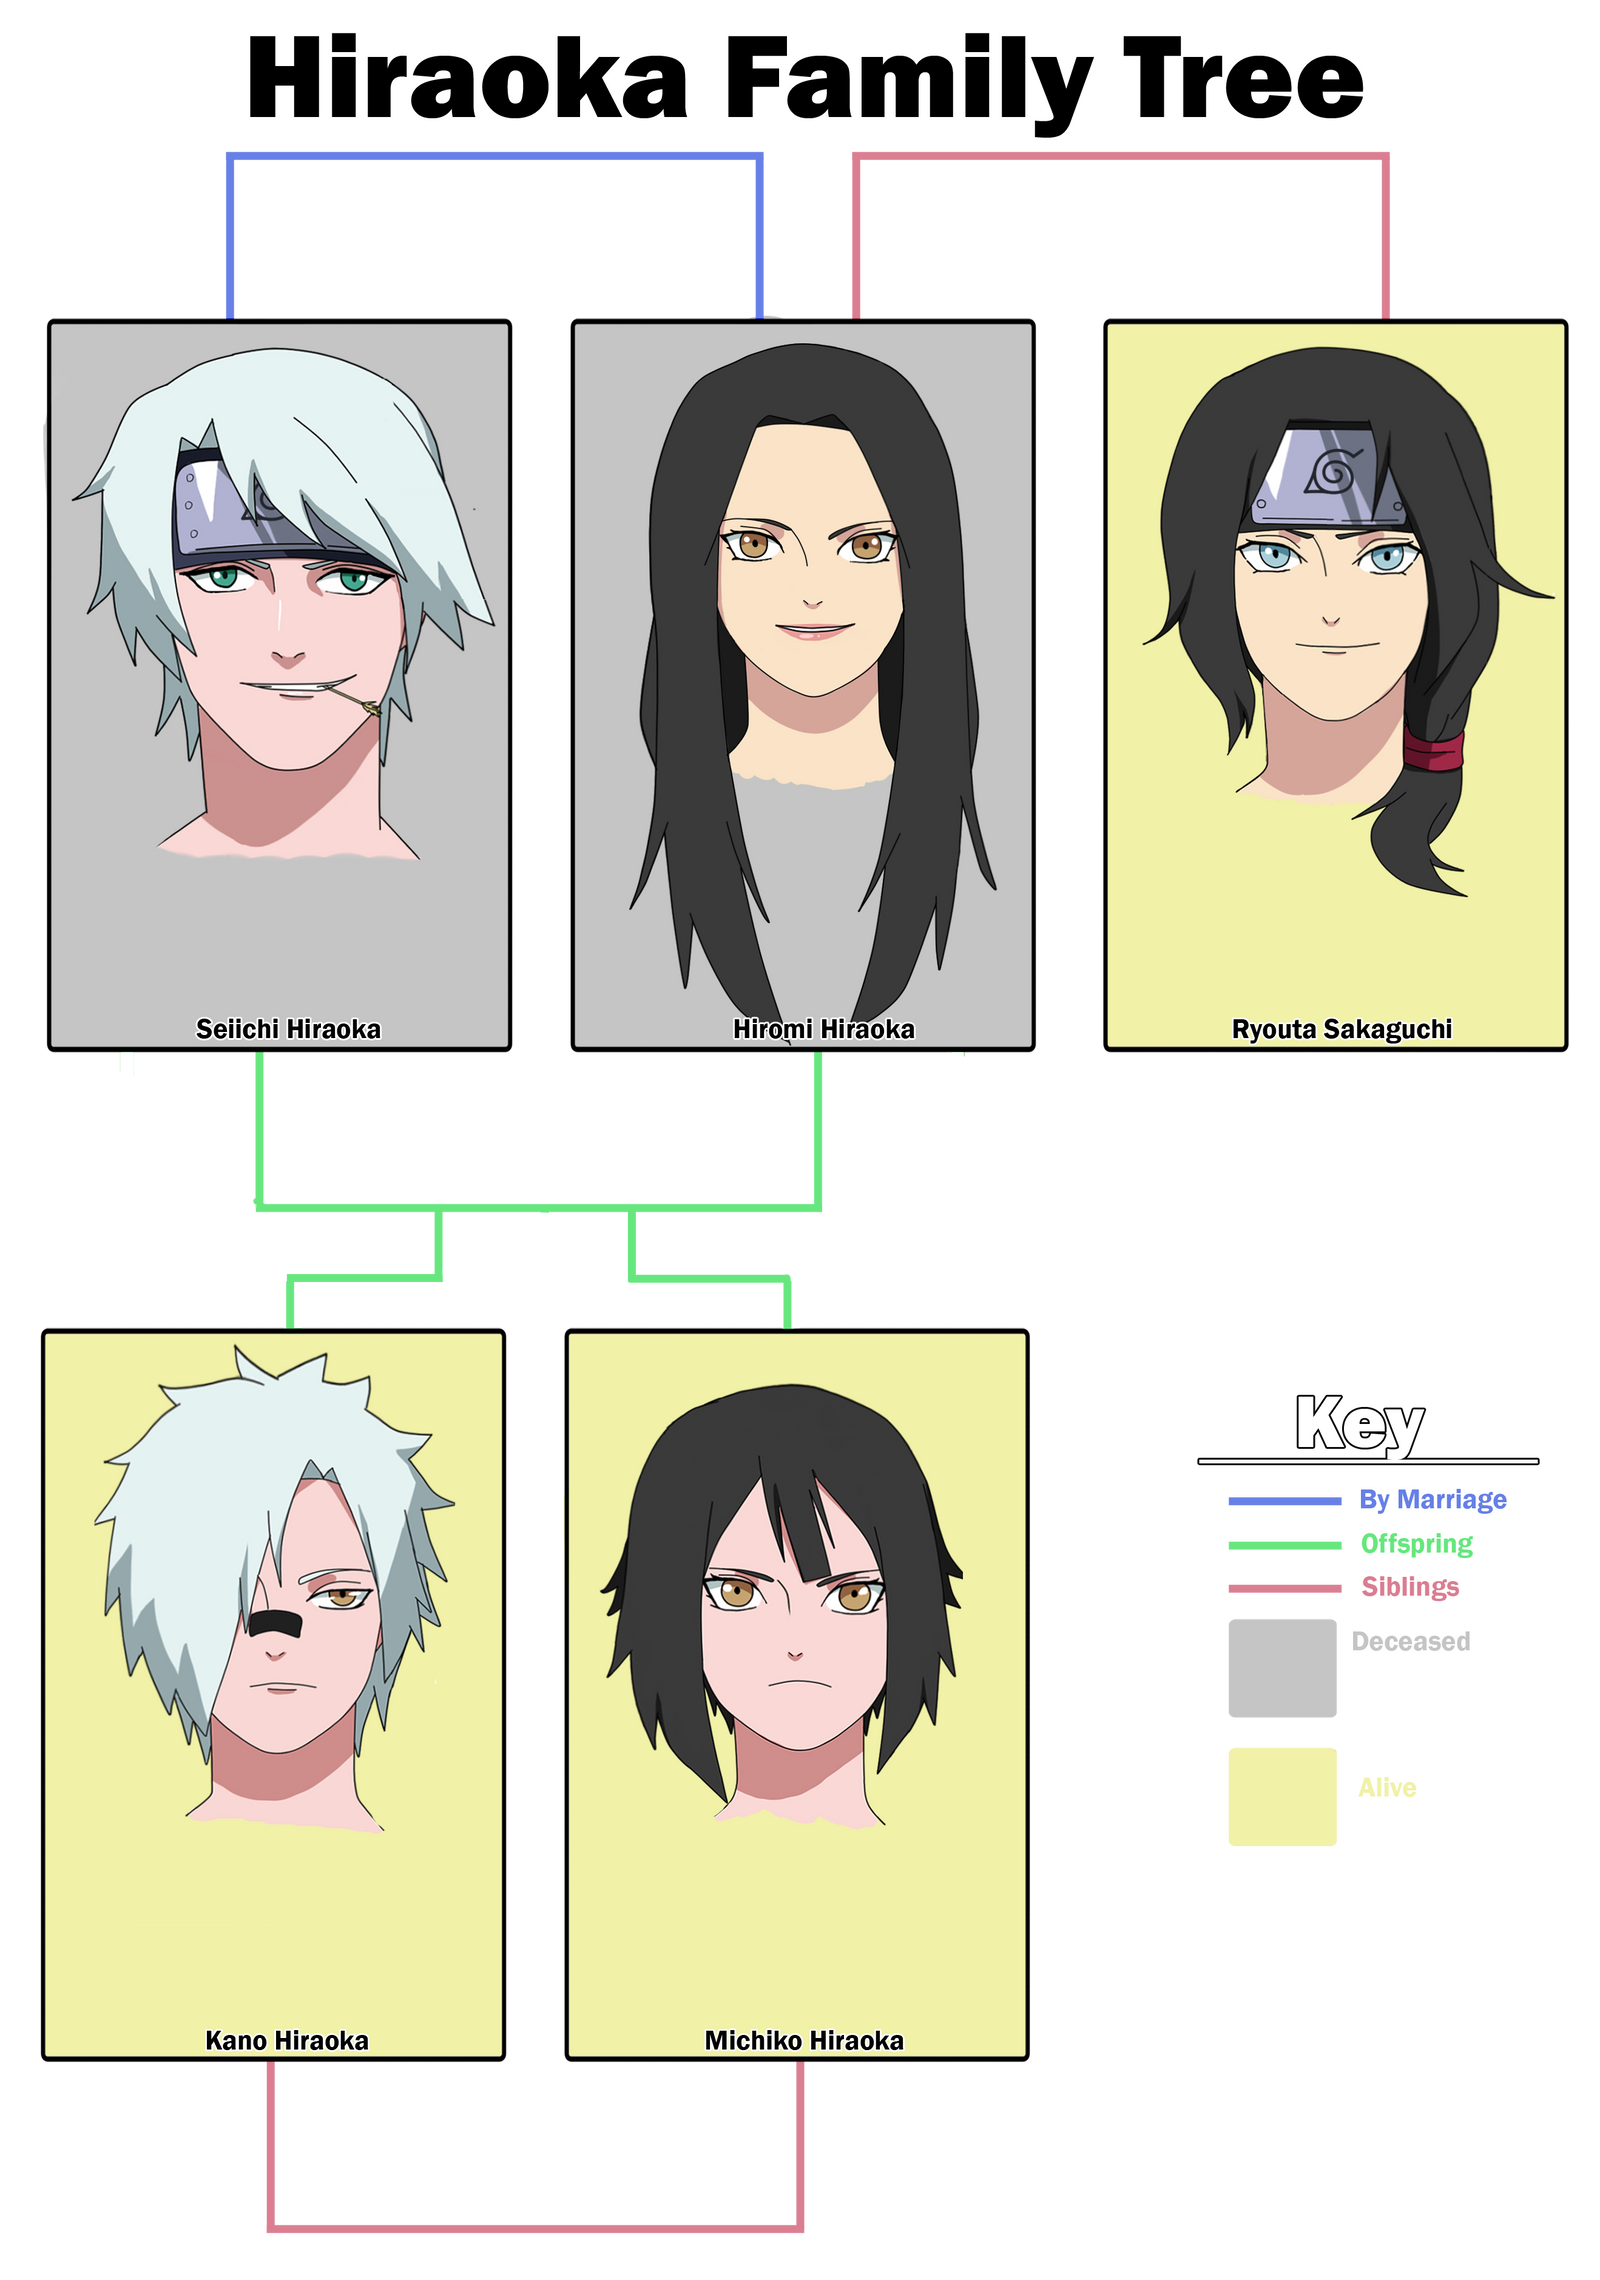 Hiraoka Family Tree by anniberri